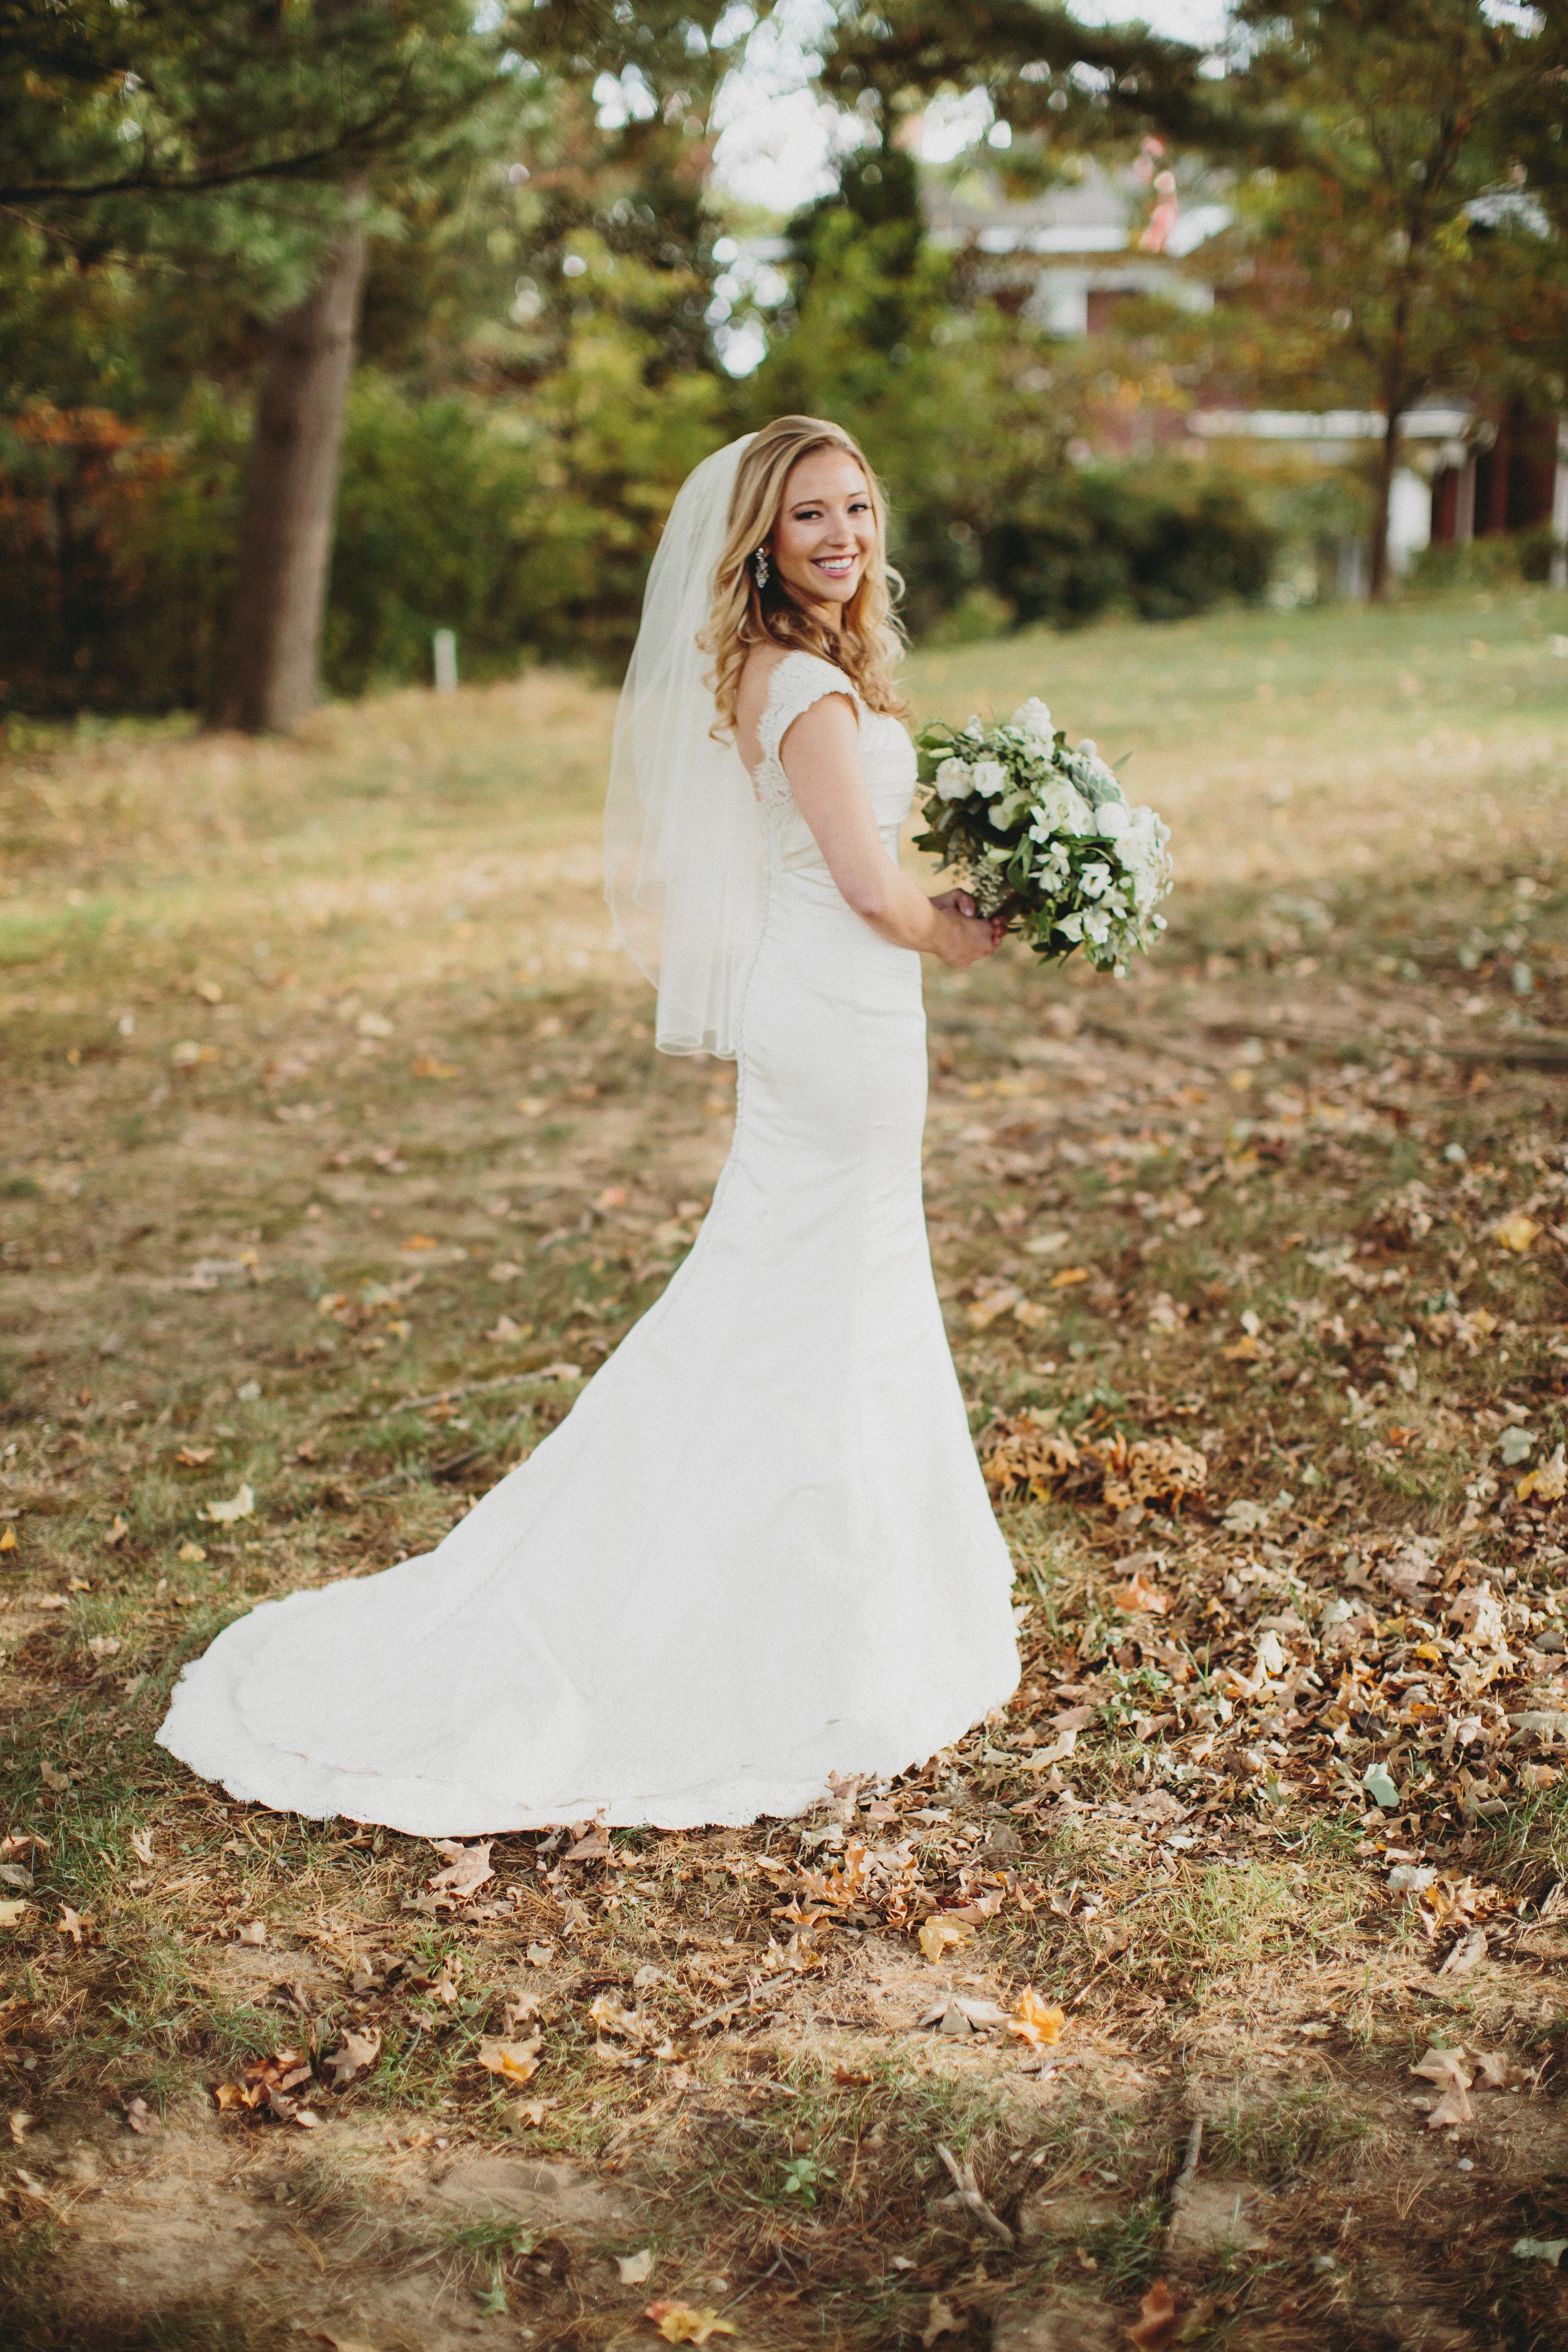 the_carrs_photography_katie_matt_wedding_0315.jpg